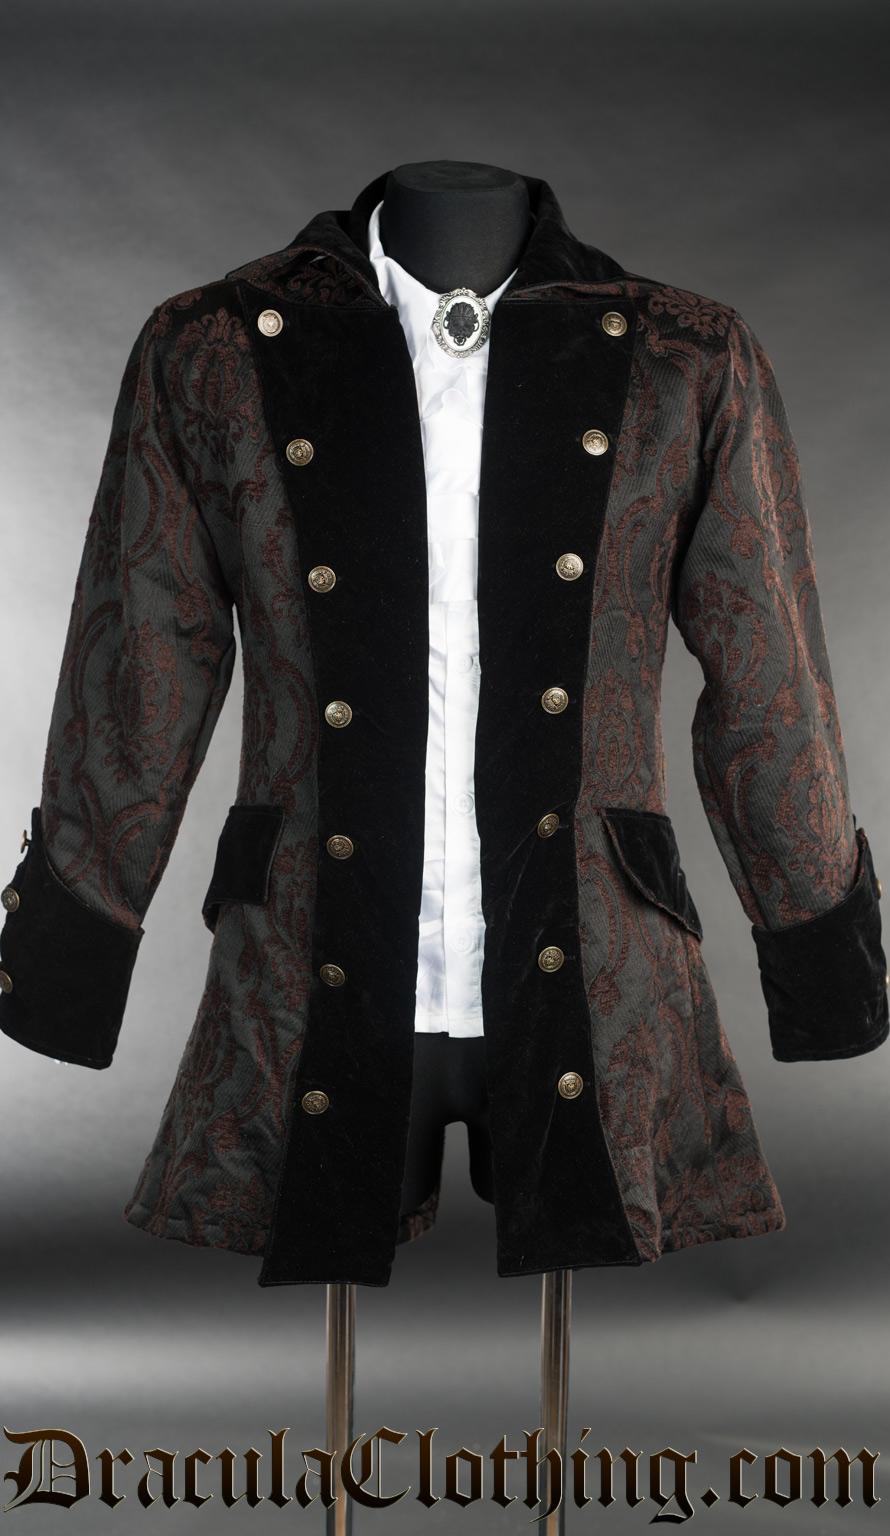 Steampunk Brocade Pirate Jacket